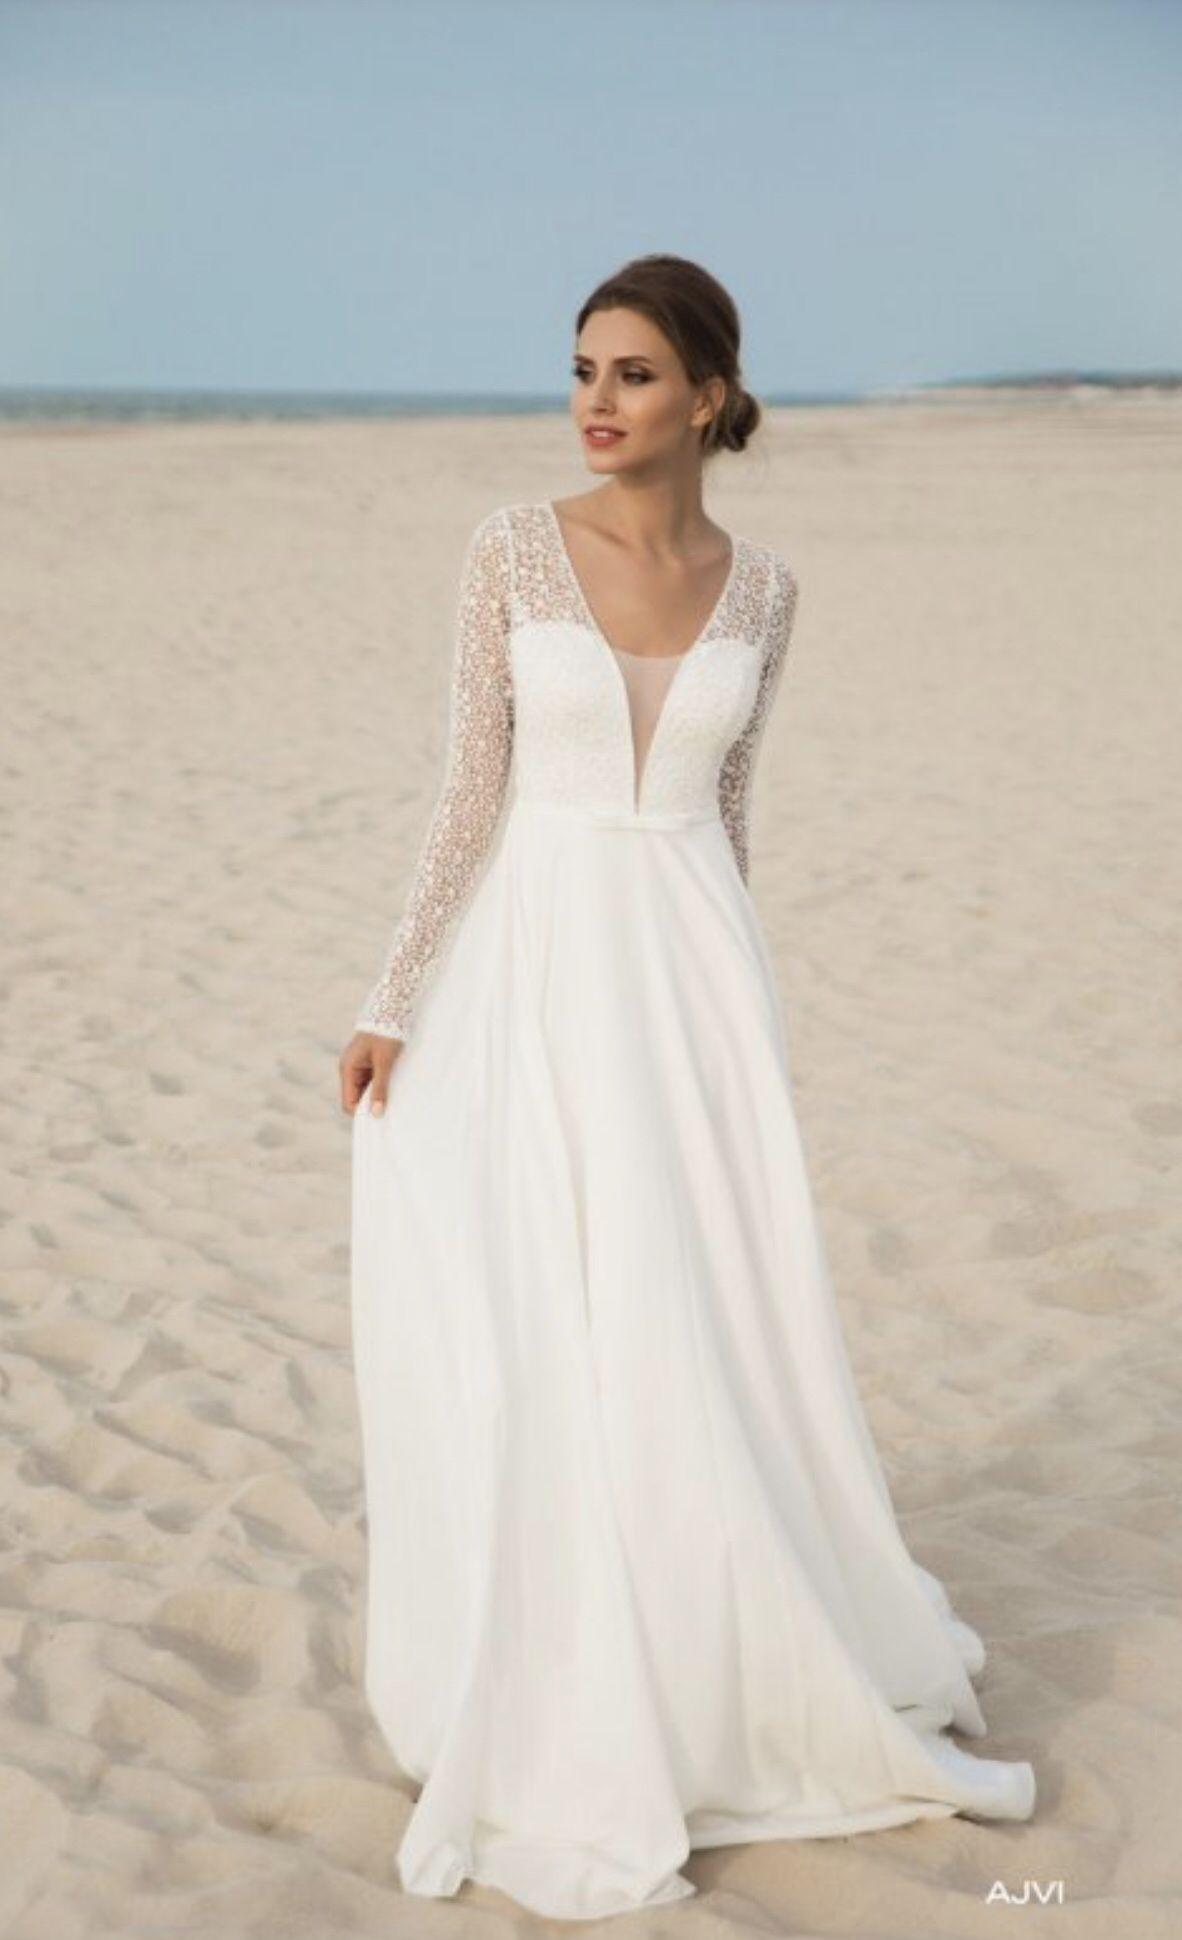 Le Rina - Brautkleid Ajvi - Hochzeitskleid  Hochzeitskleid ärmel